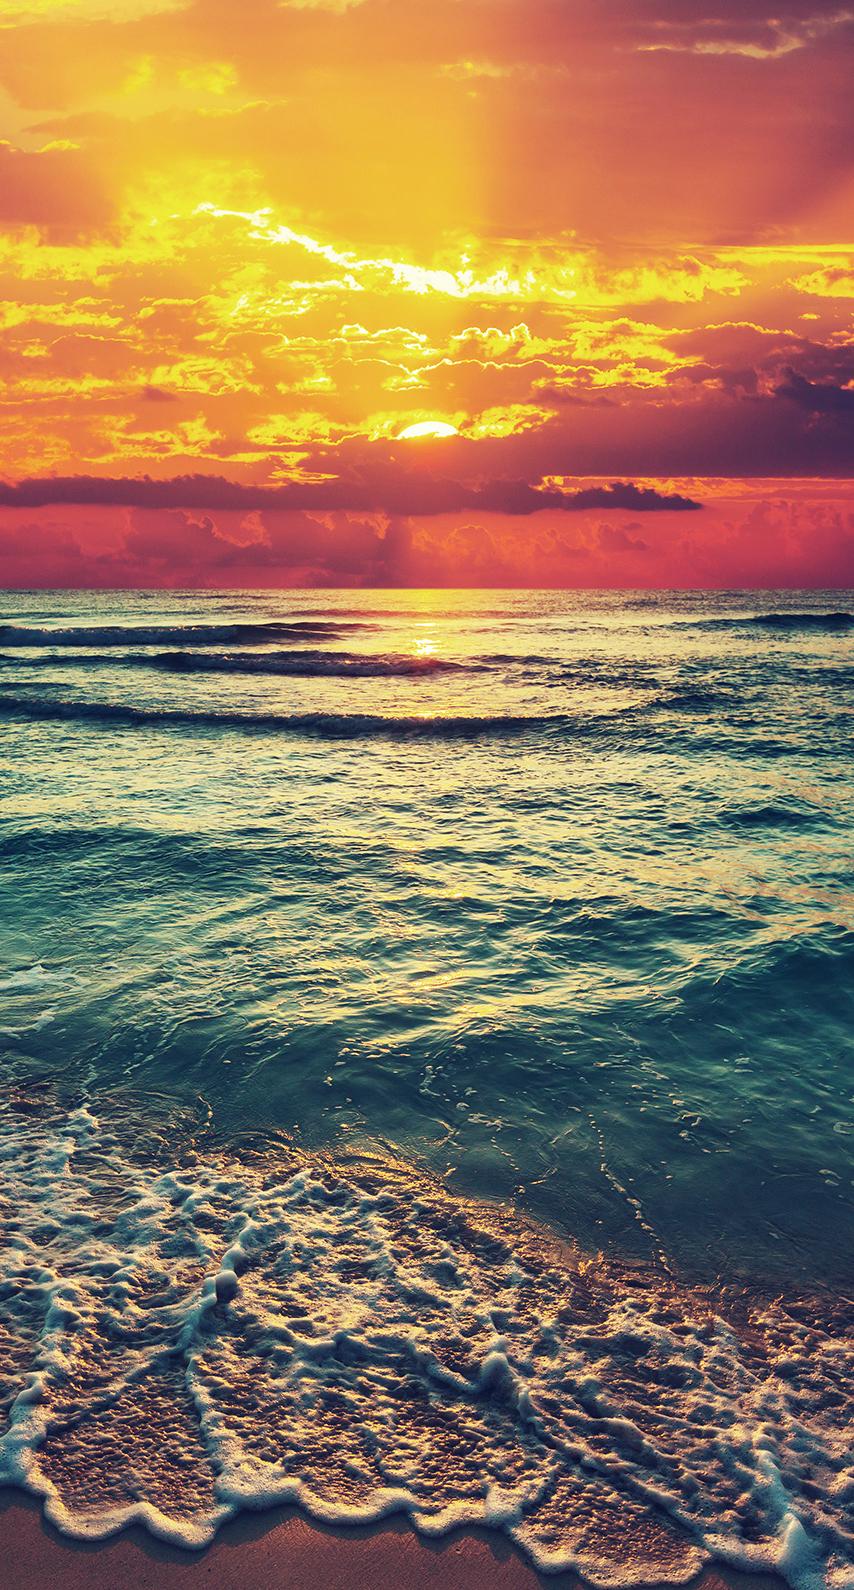 sunlight, body of water